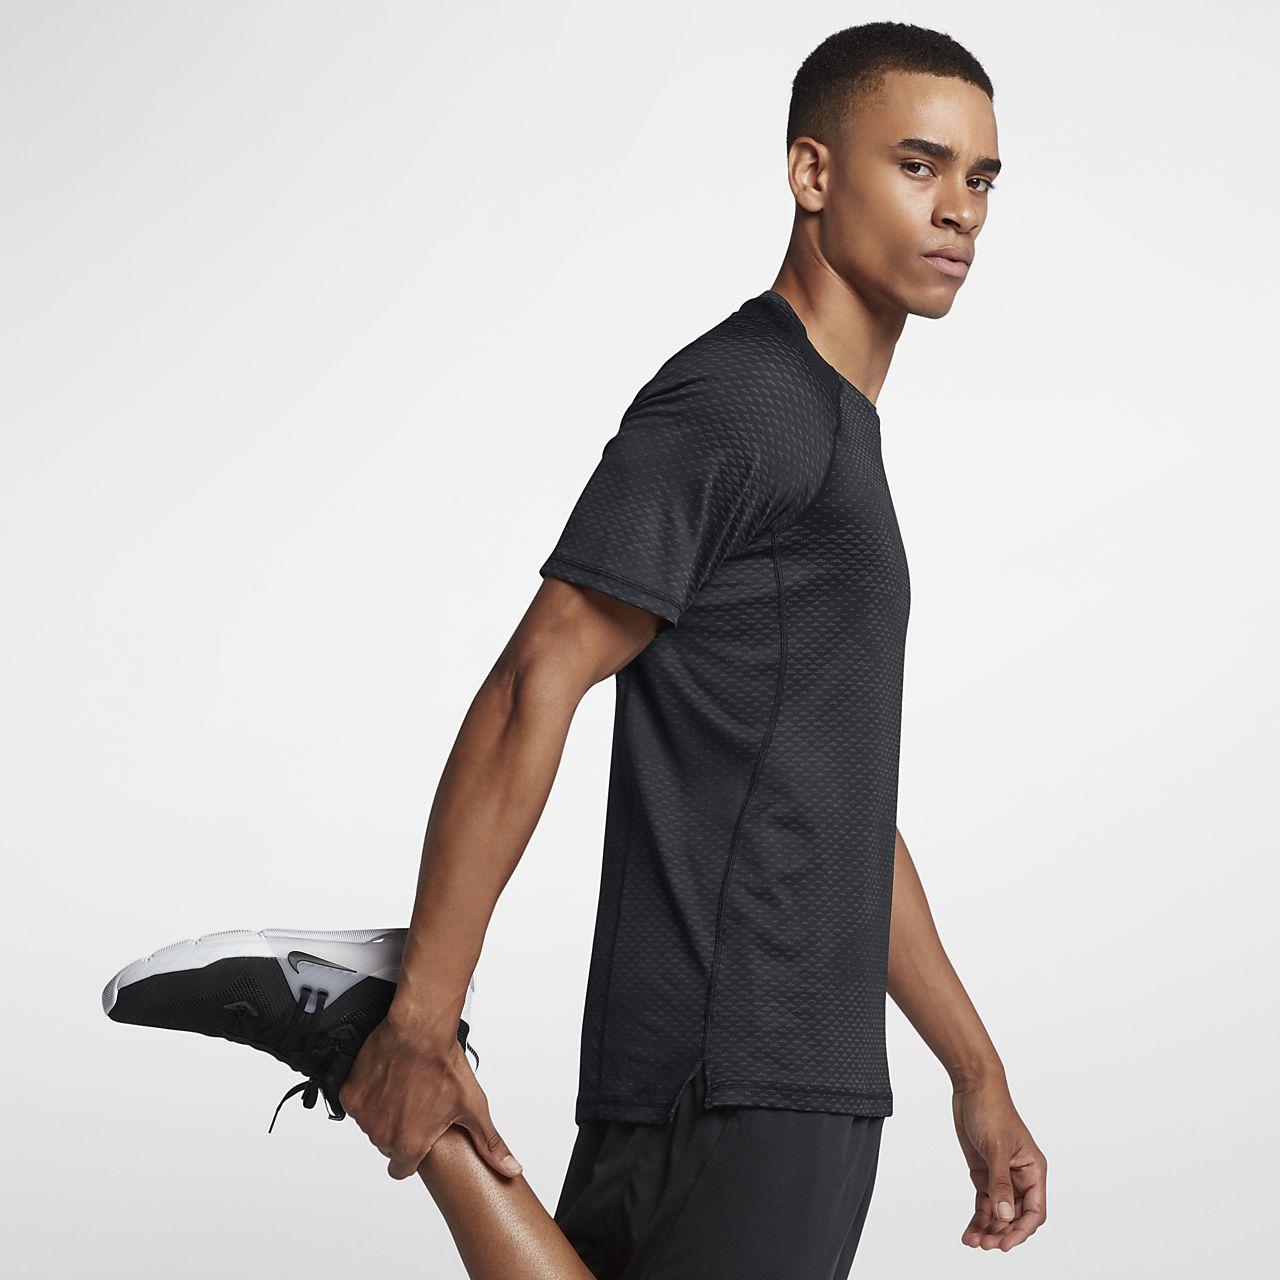 finest selection 32205 2b4a2 ... Nike Pro HyperCool Men s Short-Sleeve Training Top